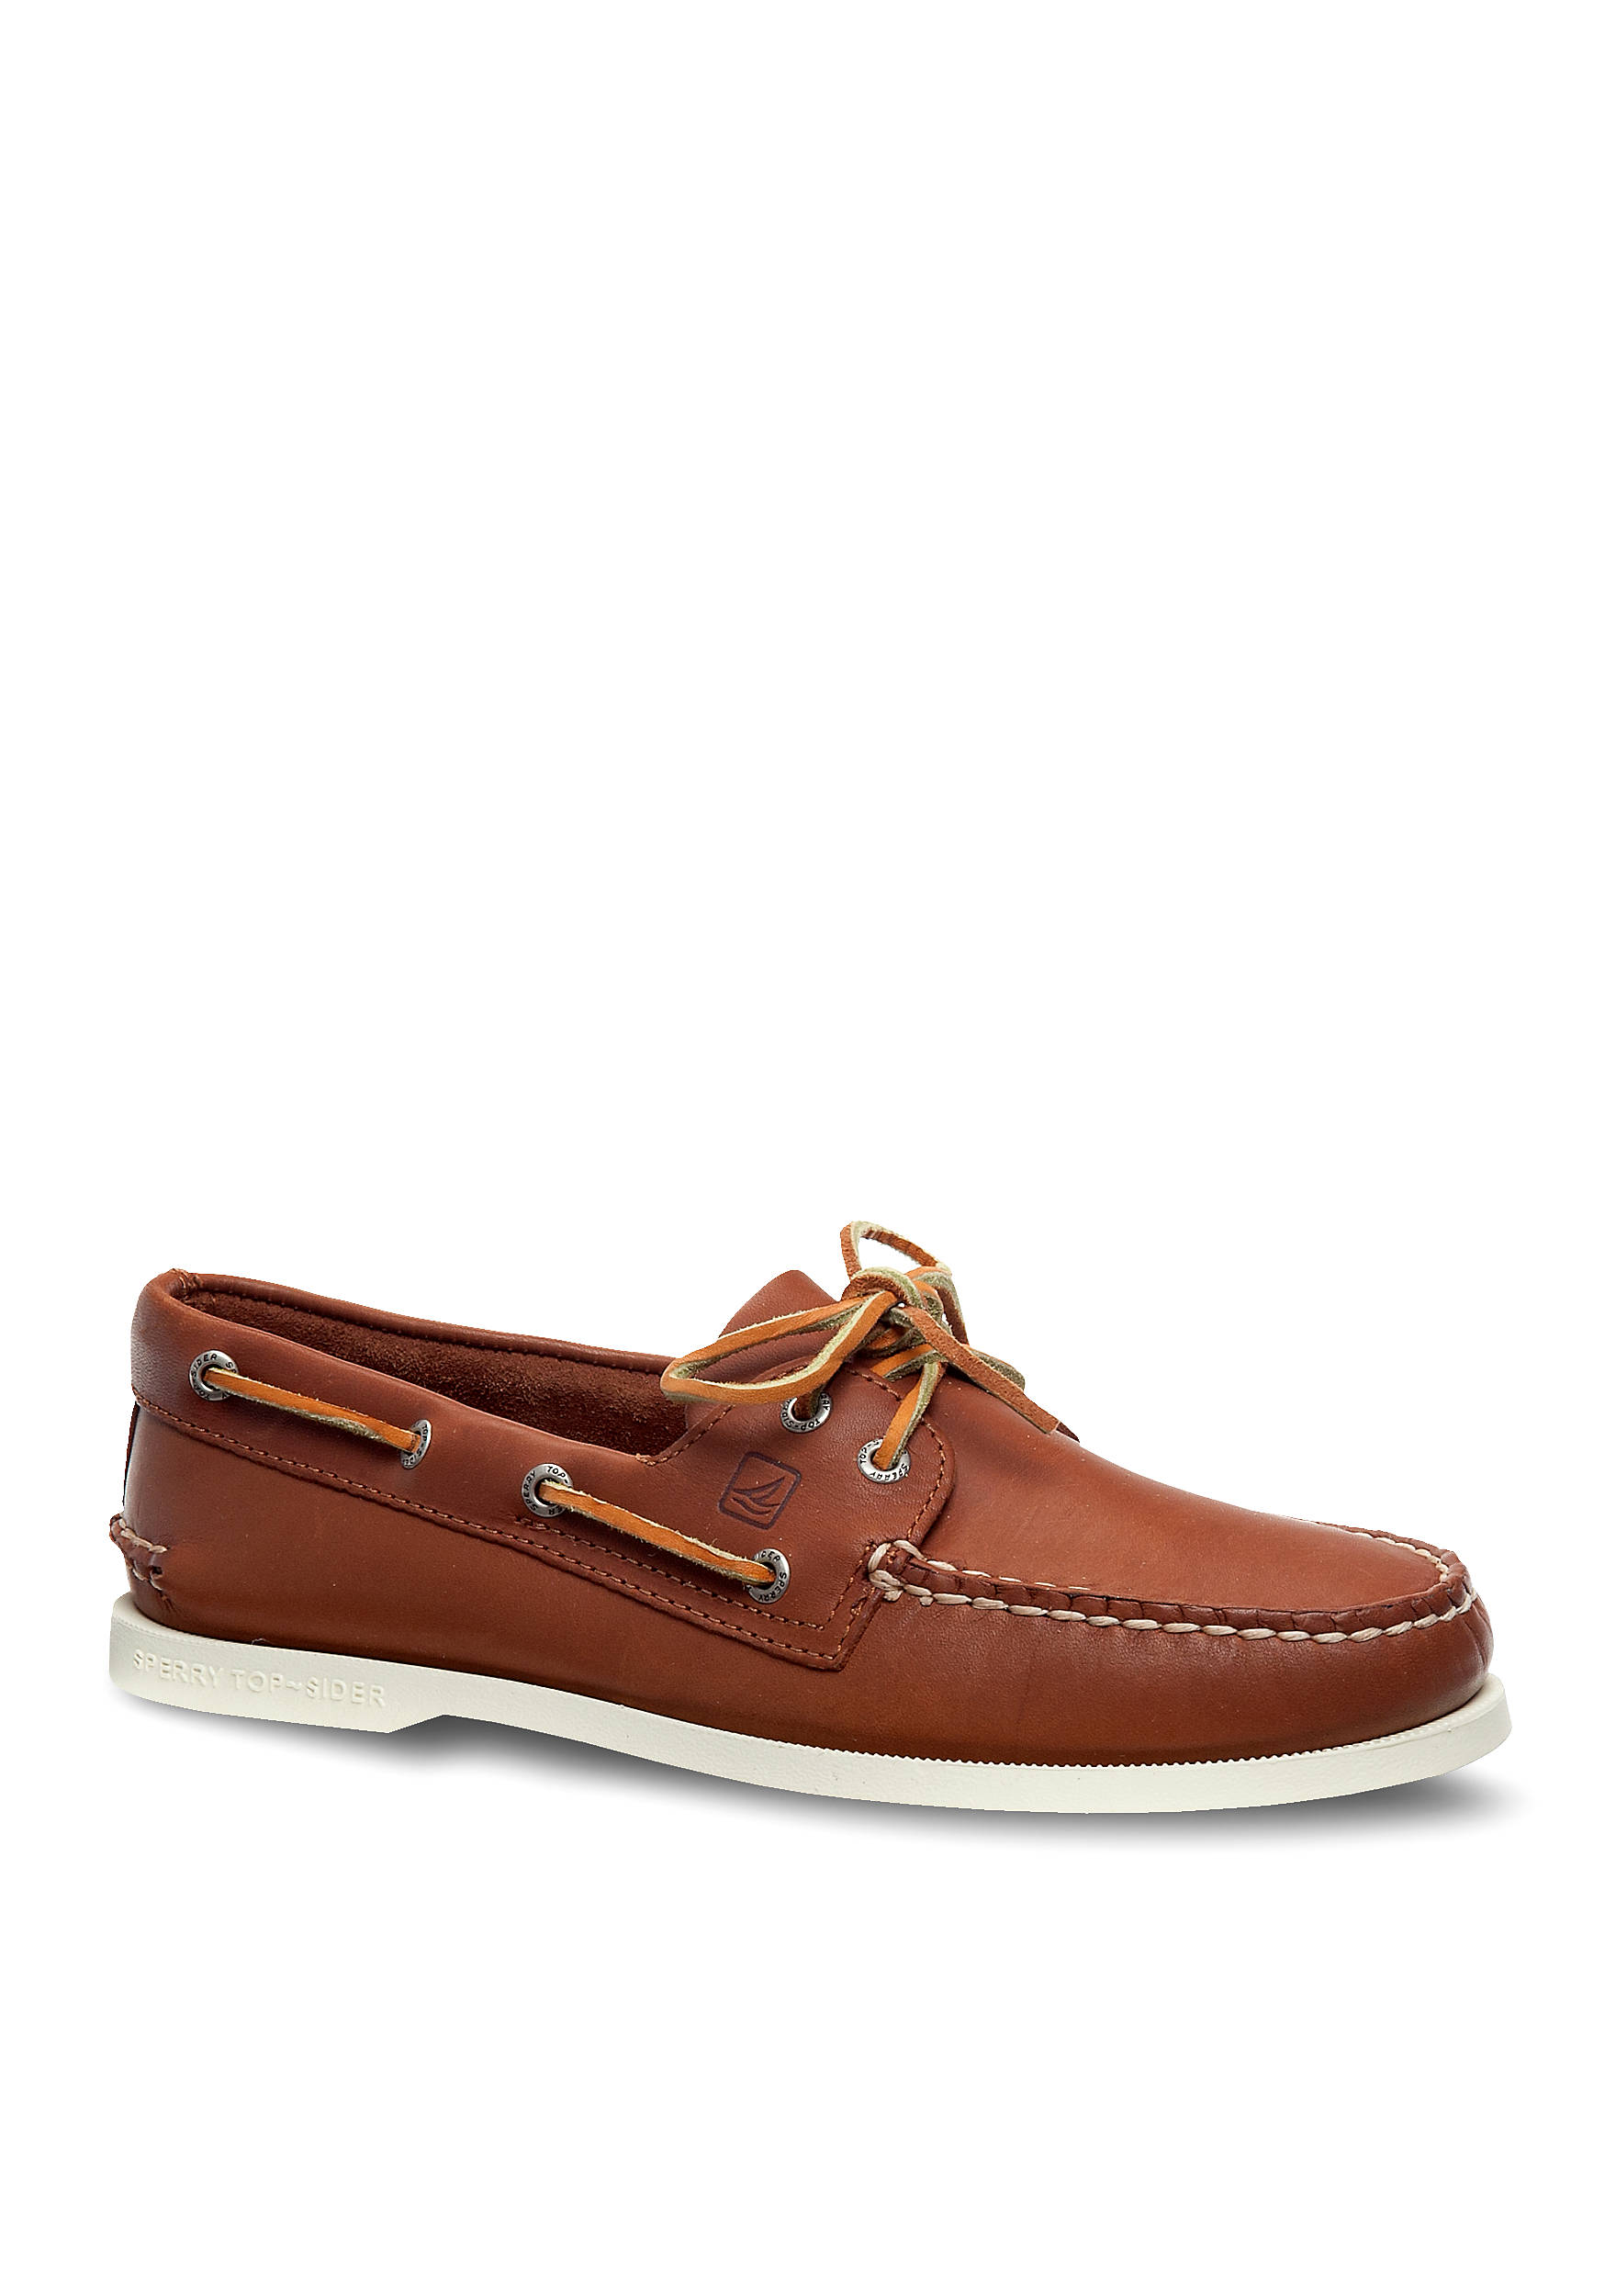 Belk Casual Mens Shoes